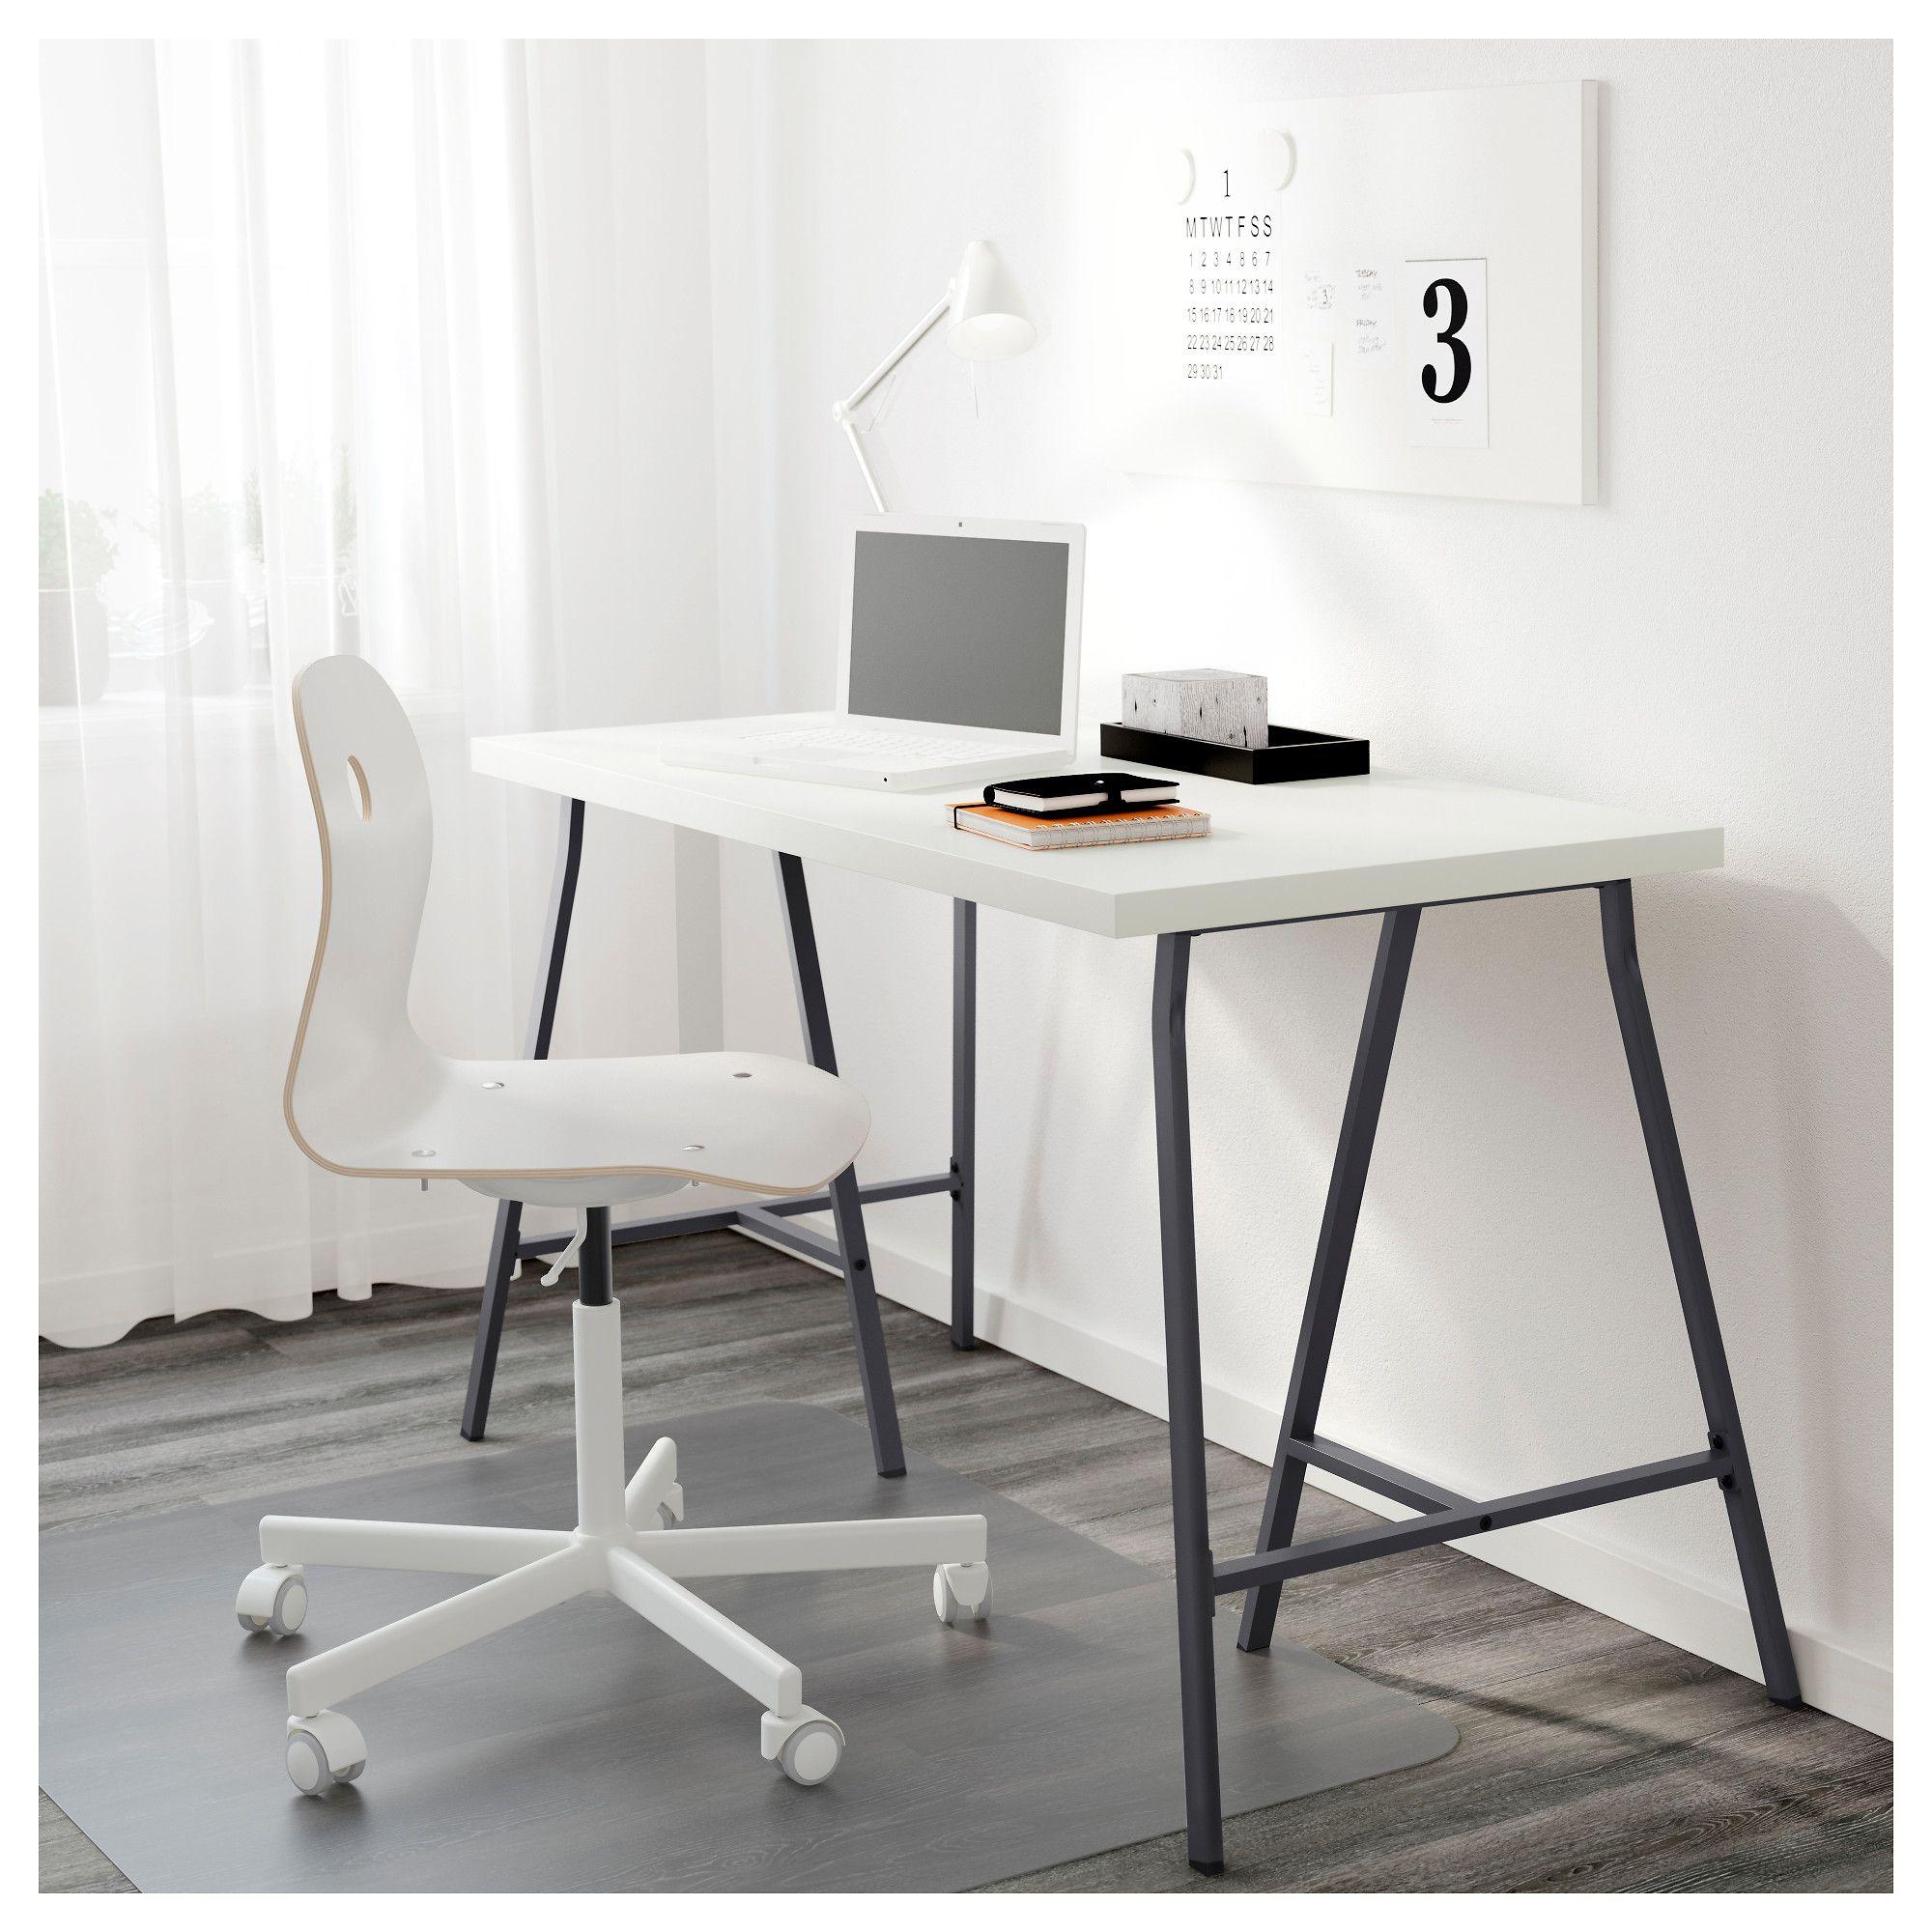 Linnmon Lerberg White Grey Table 120x60 Cm Ikea Cheap Office Furniture Classic Office Furniture Home Office Design